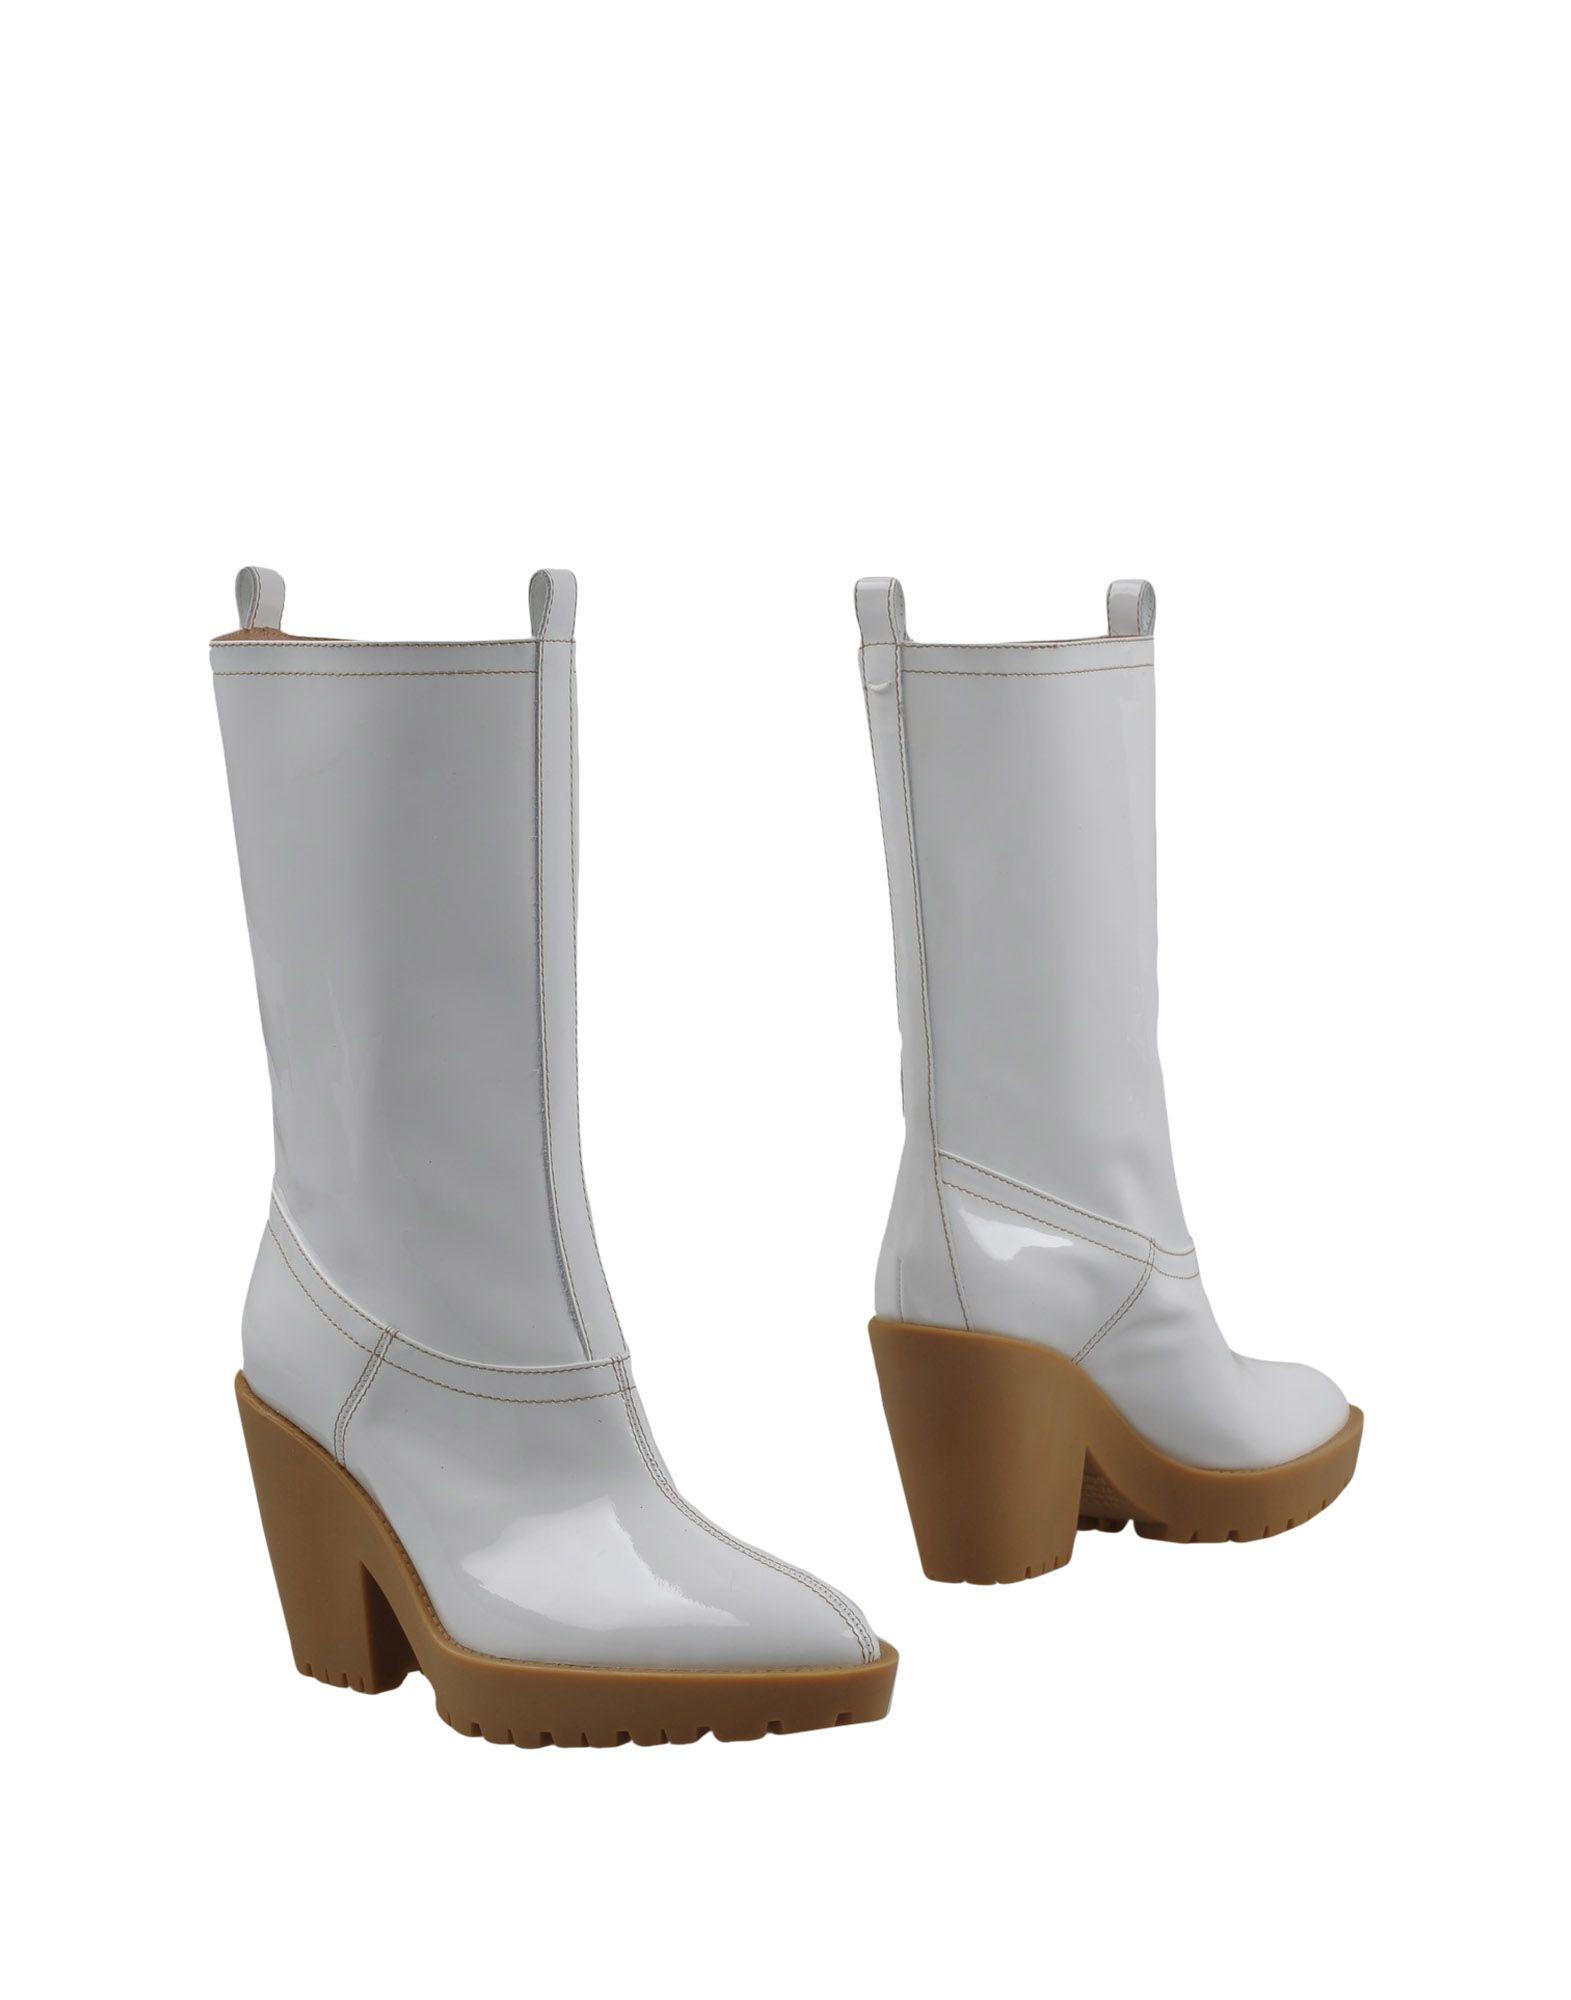 Maison Margiela Stiefelette Schuhe Damen  11353470BF Neue Schuhe Stiefelette b9e4f8